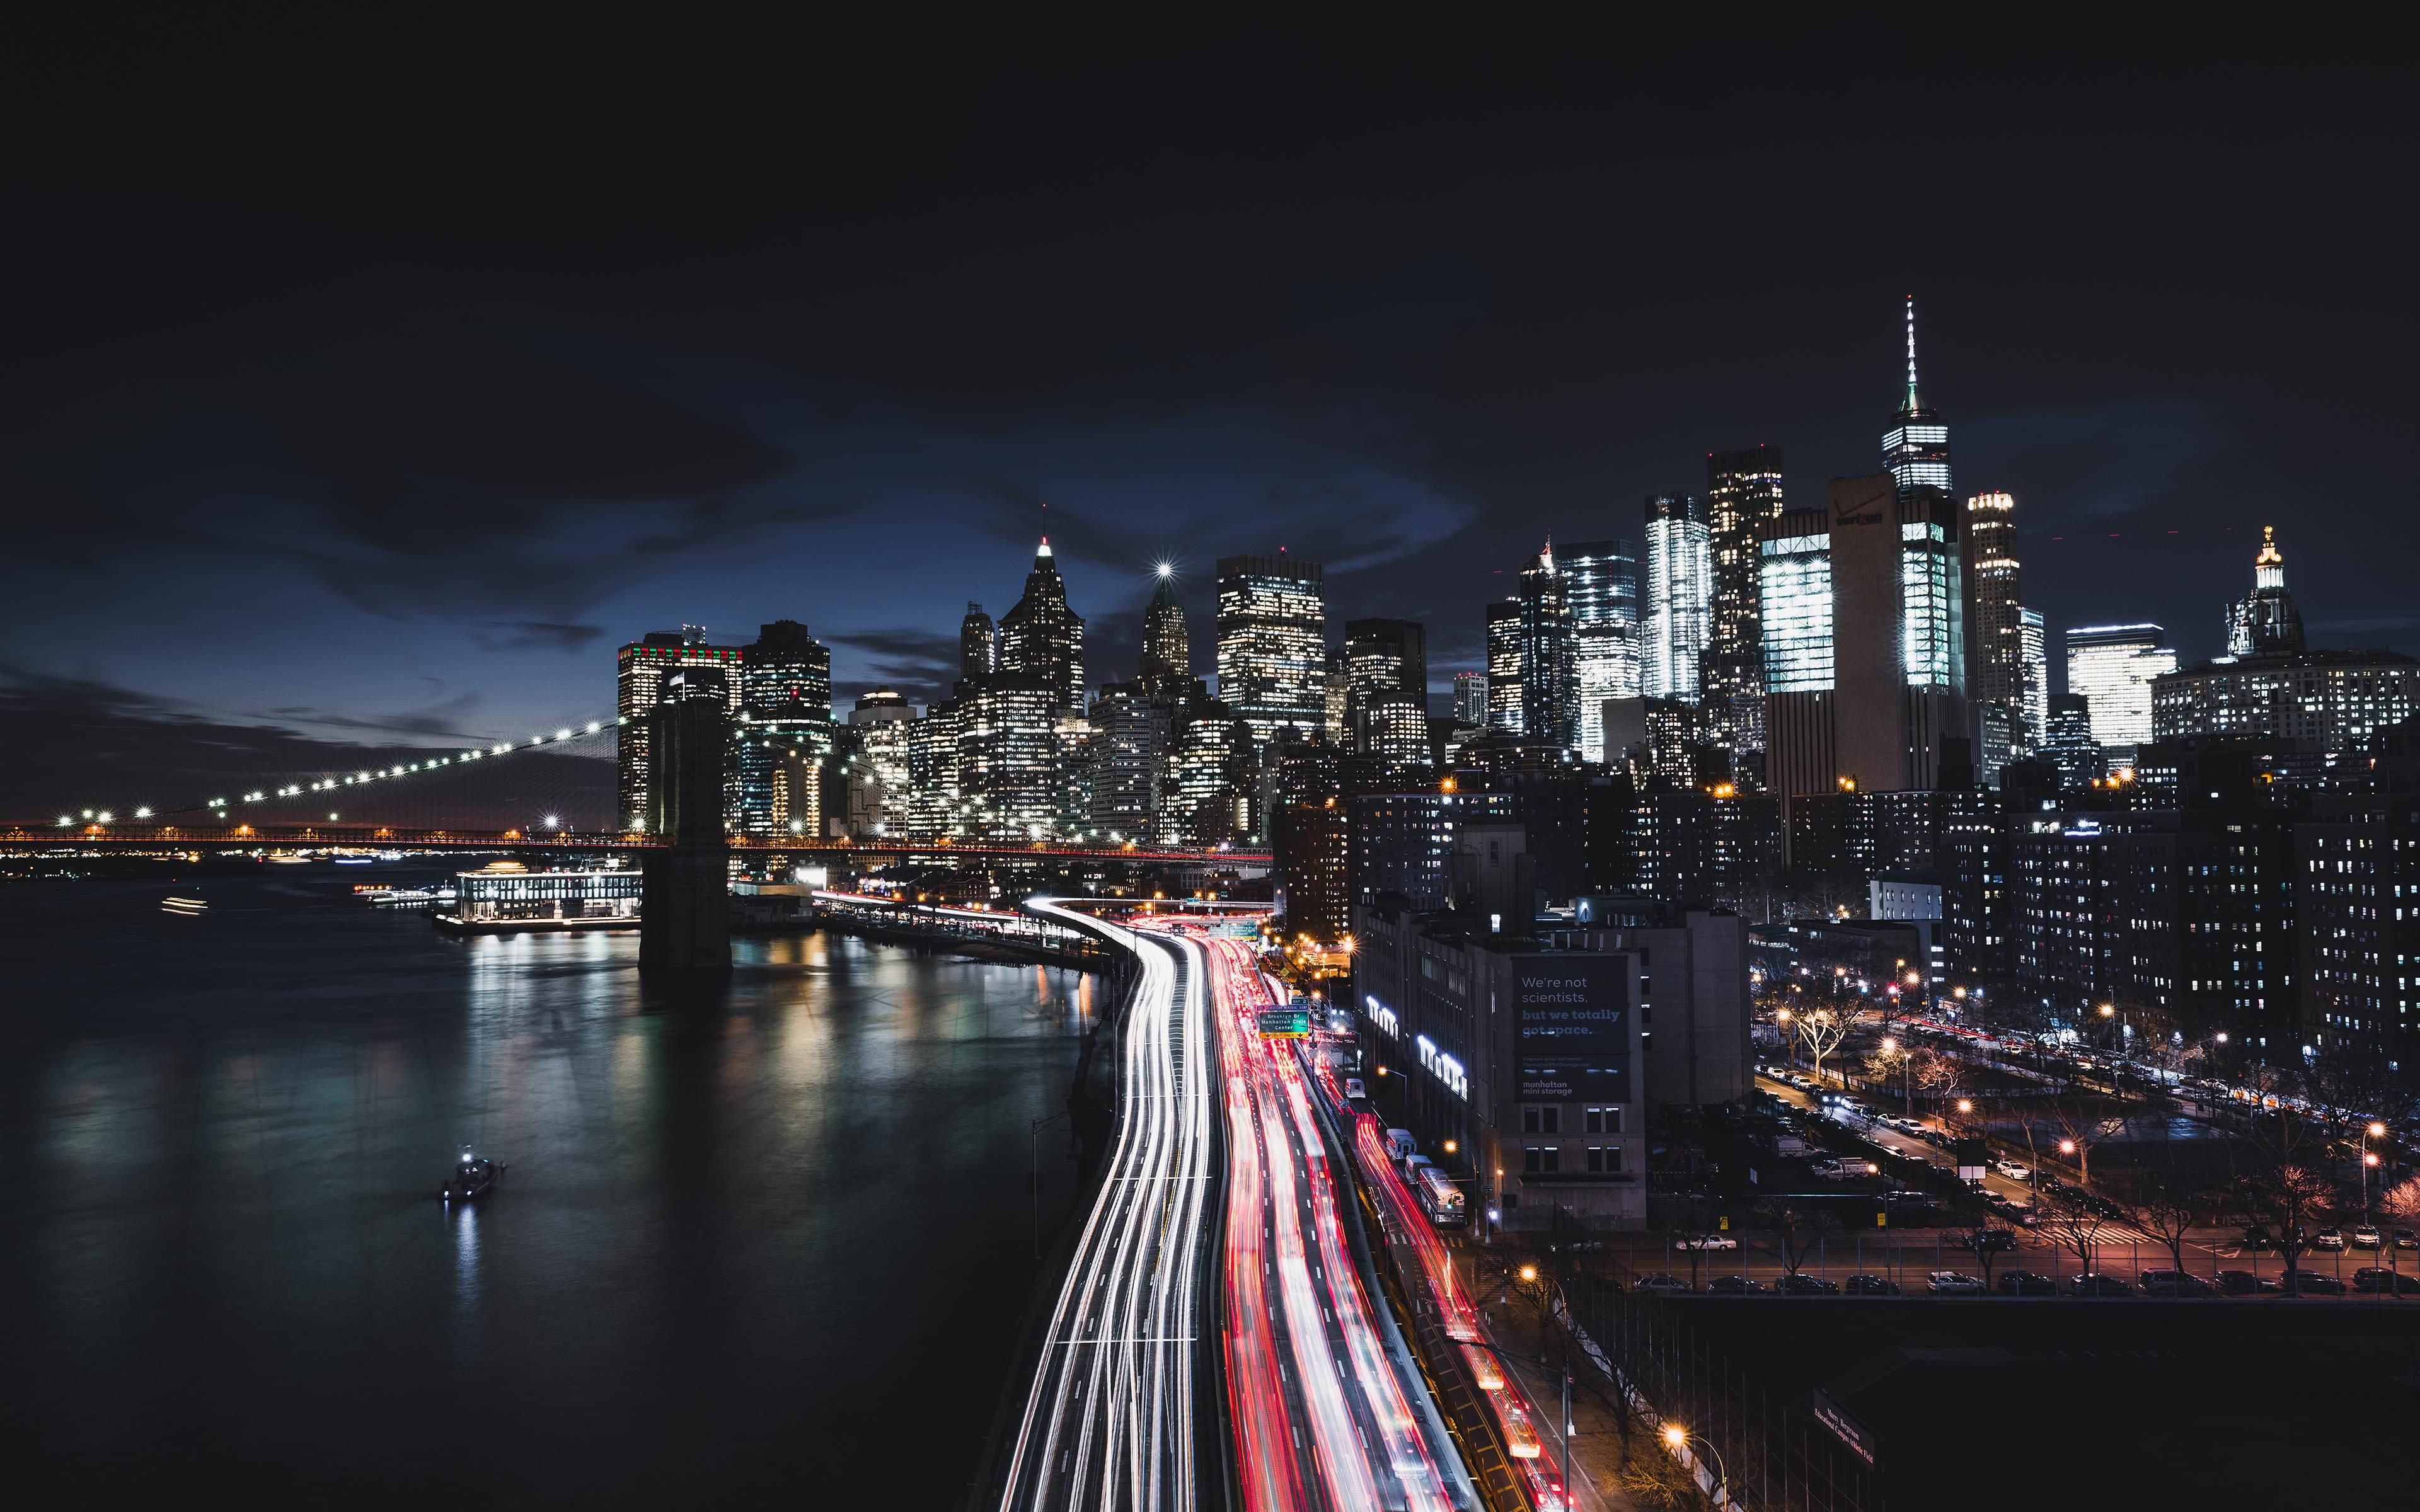 New York City 4k Wallpapers Wallpaper Cave